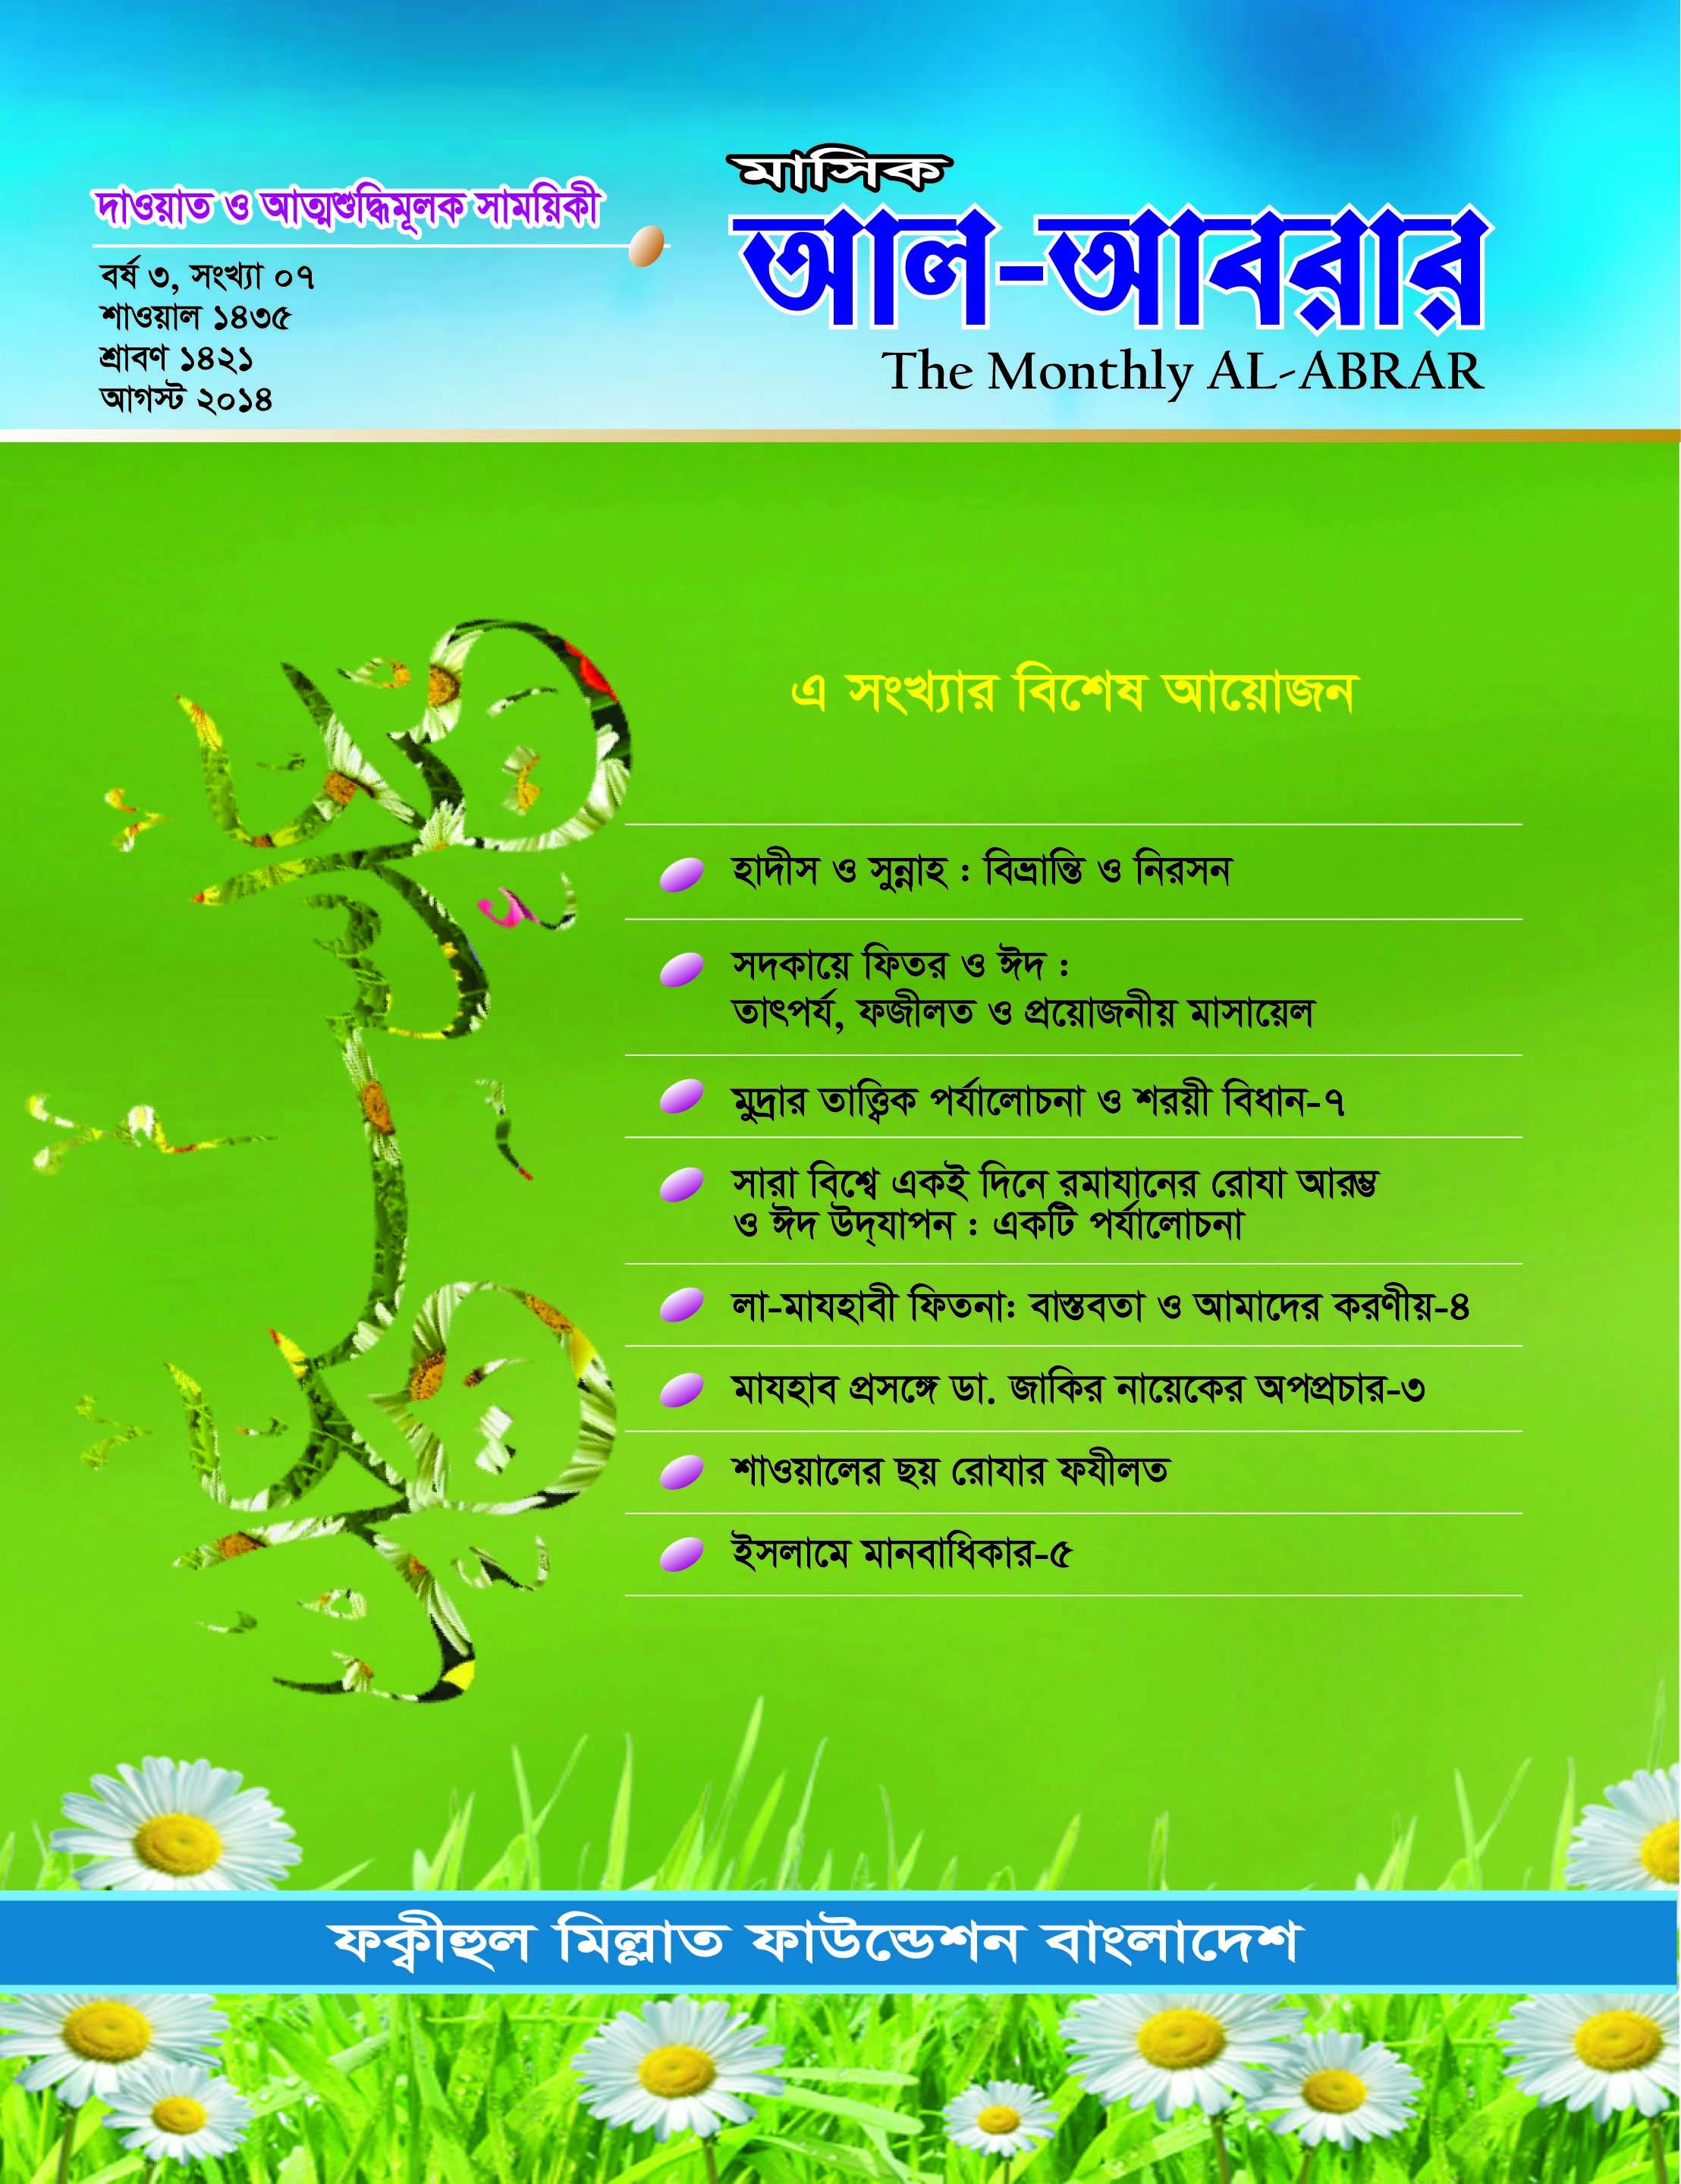 Cover Finel 08-2014-Fainal-4 copy